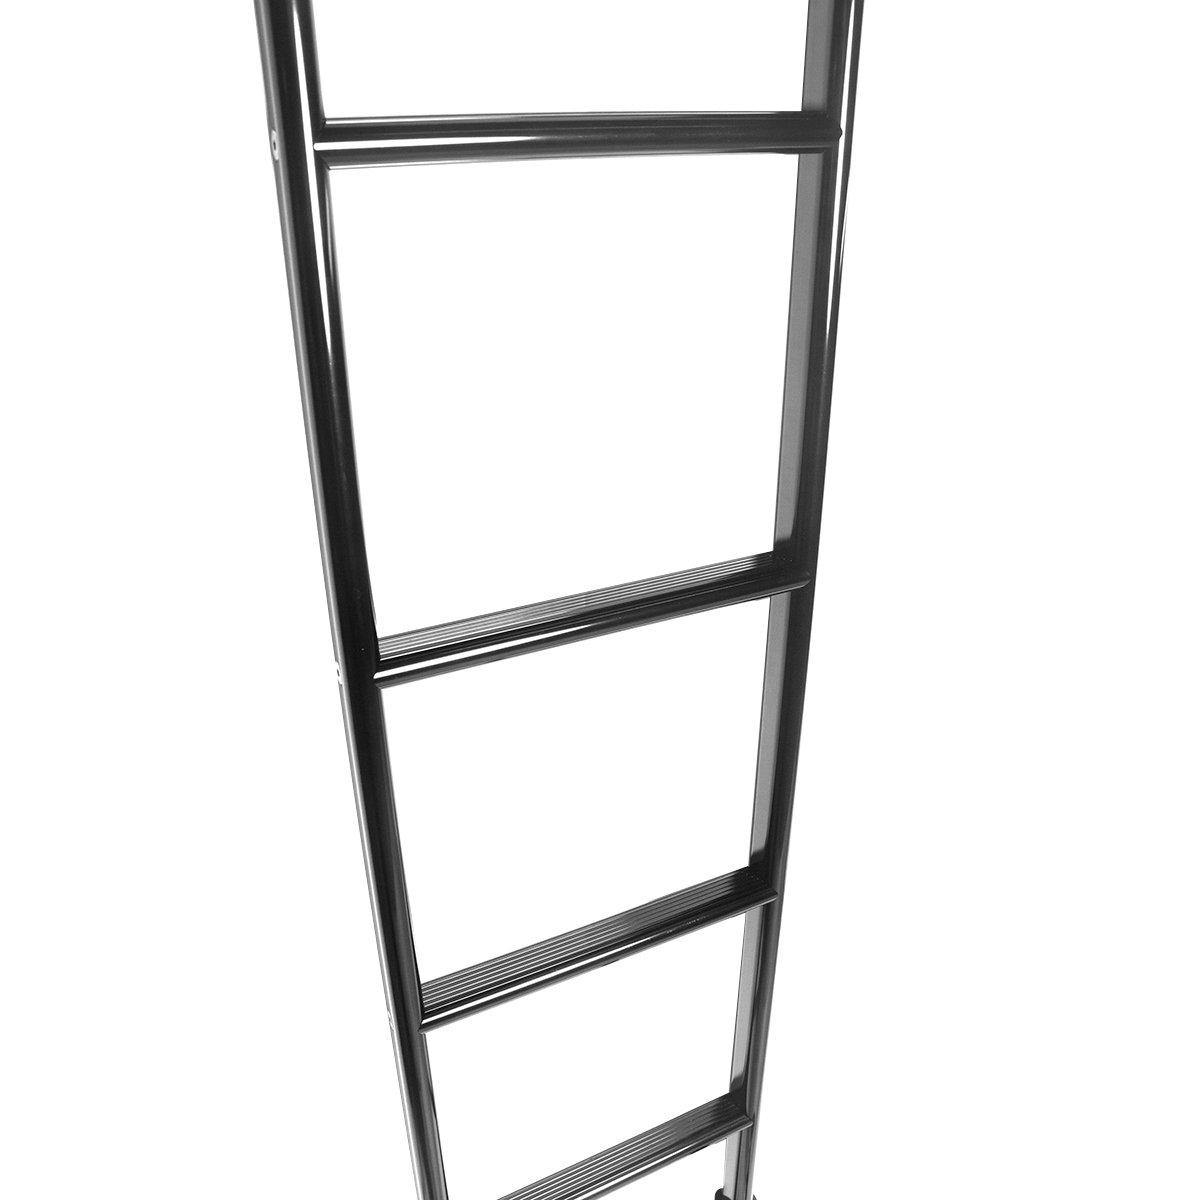 Amazon.com: Vantech - Escalera para parte posterior., Negro ...